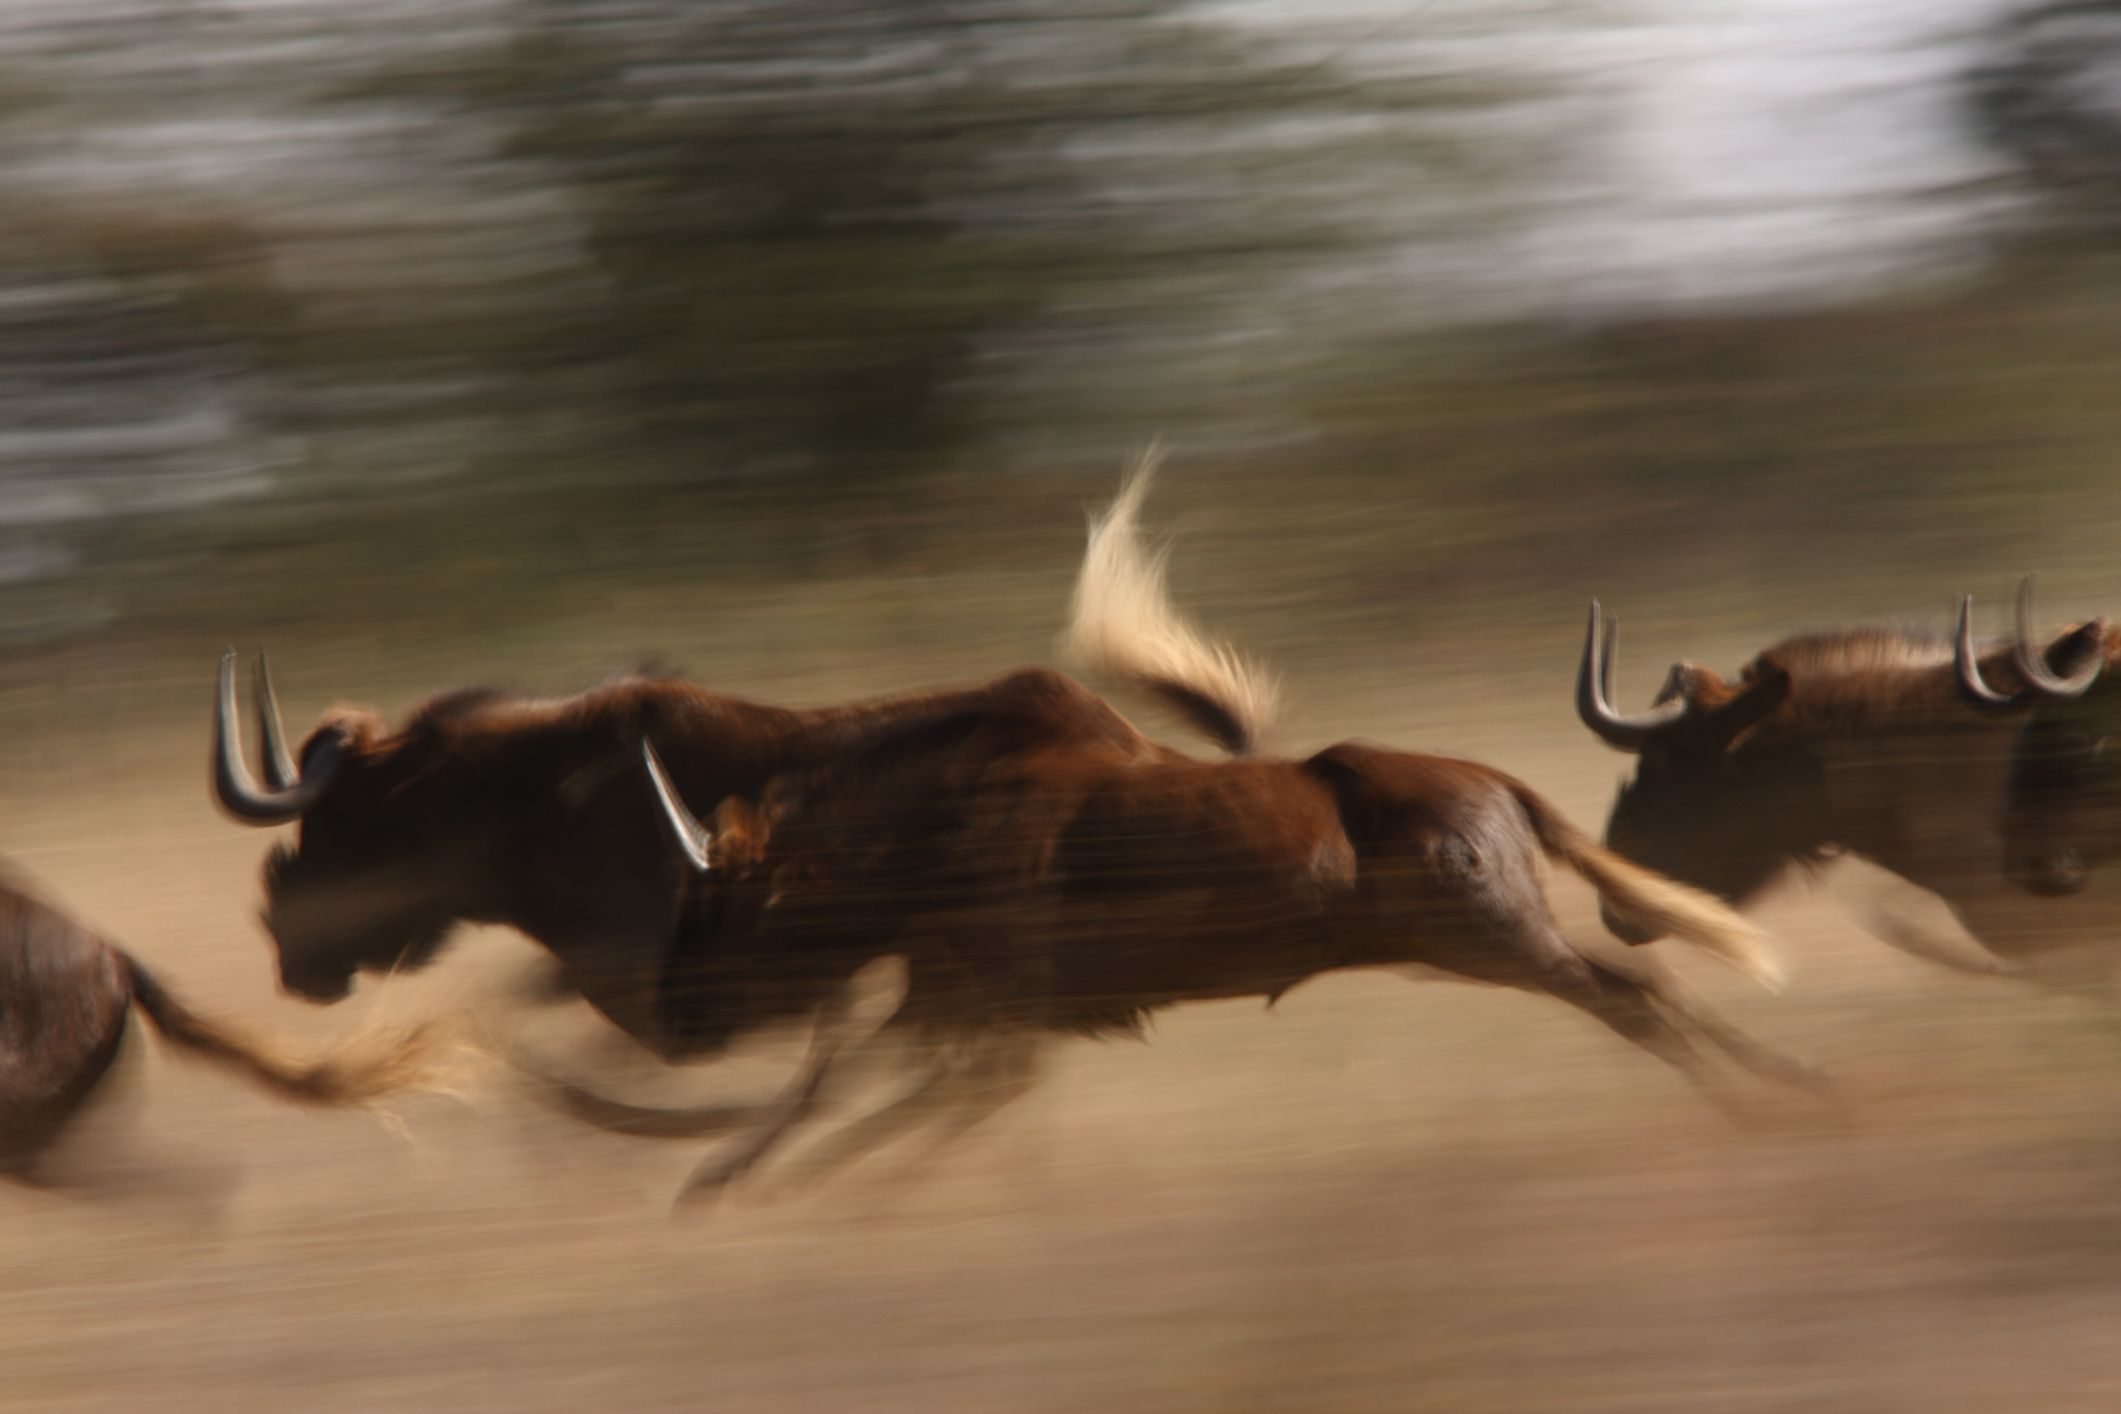 Black Wildebeest, Connochaetes gnou, herd with juveniles running in grassland at edge of bushveld, side on, slow shutter. Klipriviersberg Nature Reserve, Mondeor, Johannesburg, South Africa